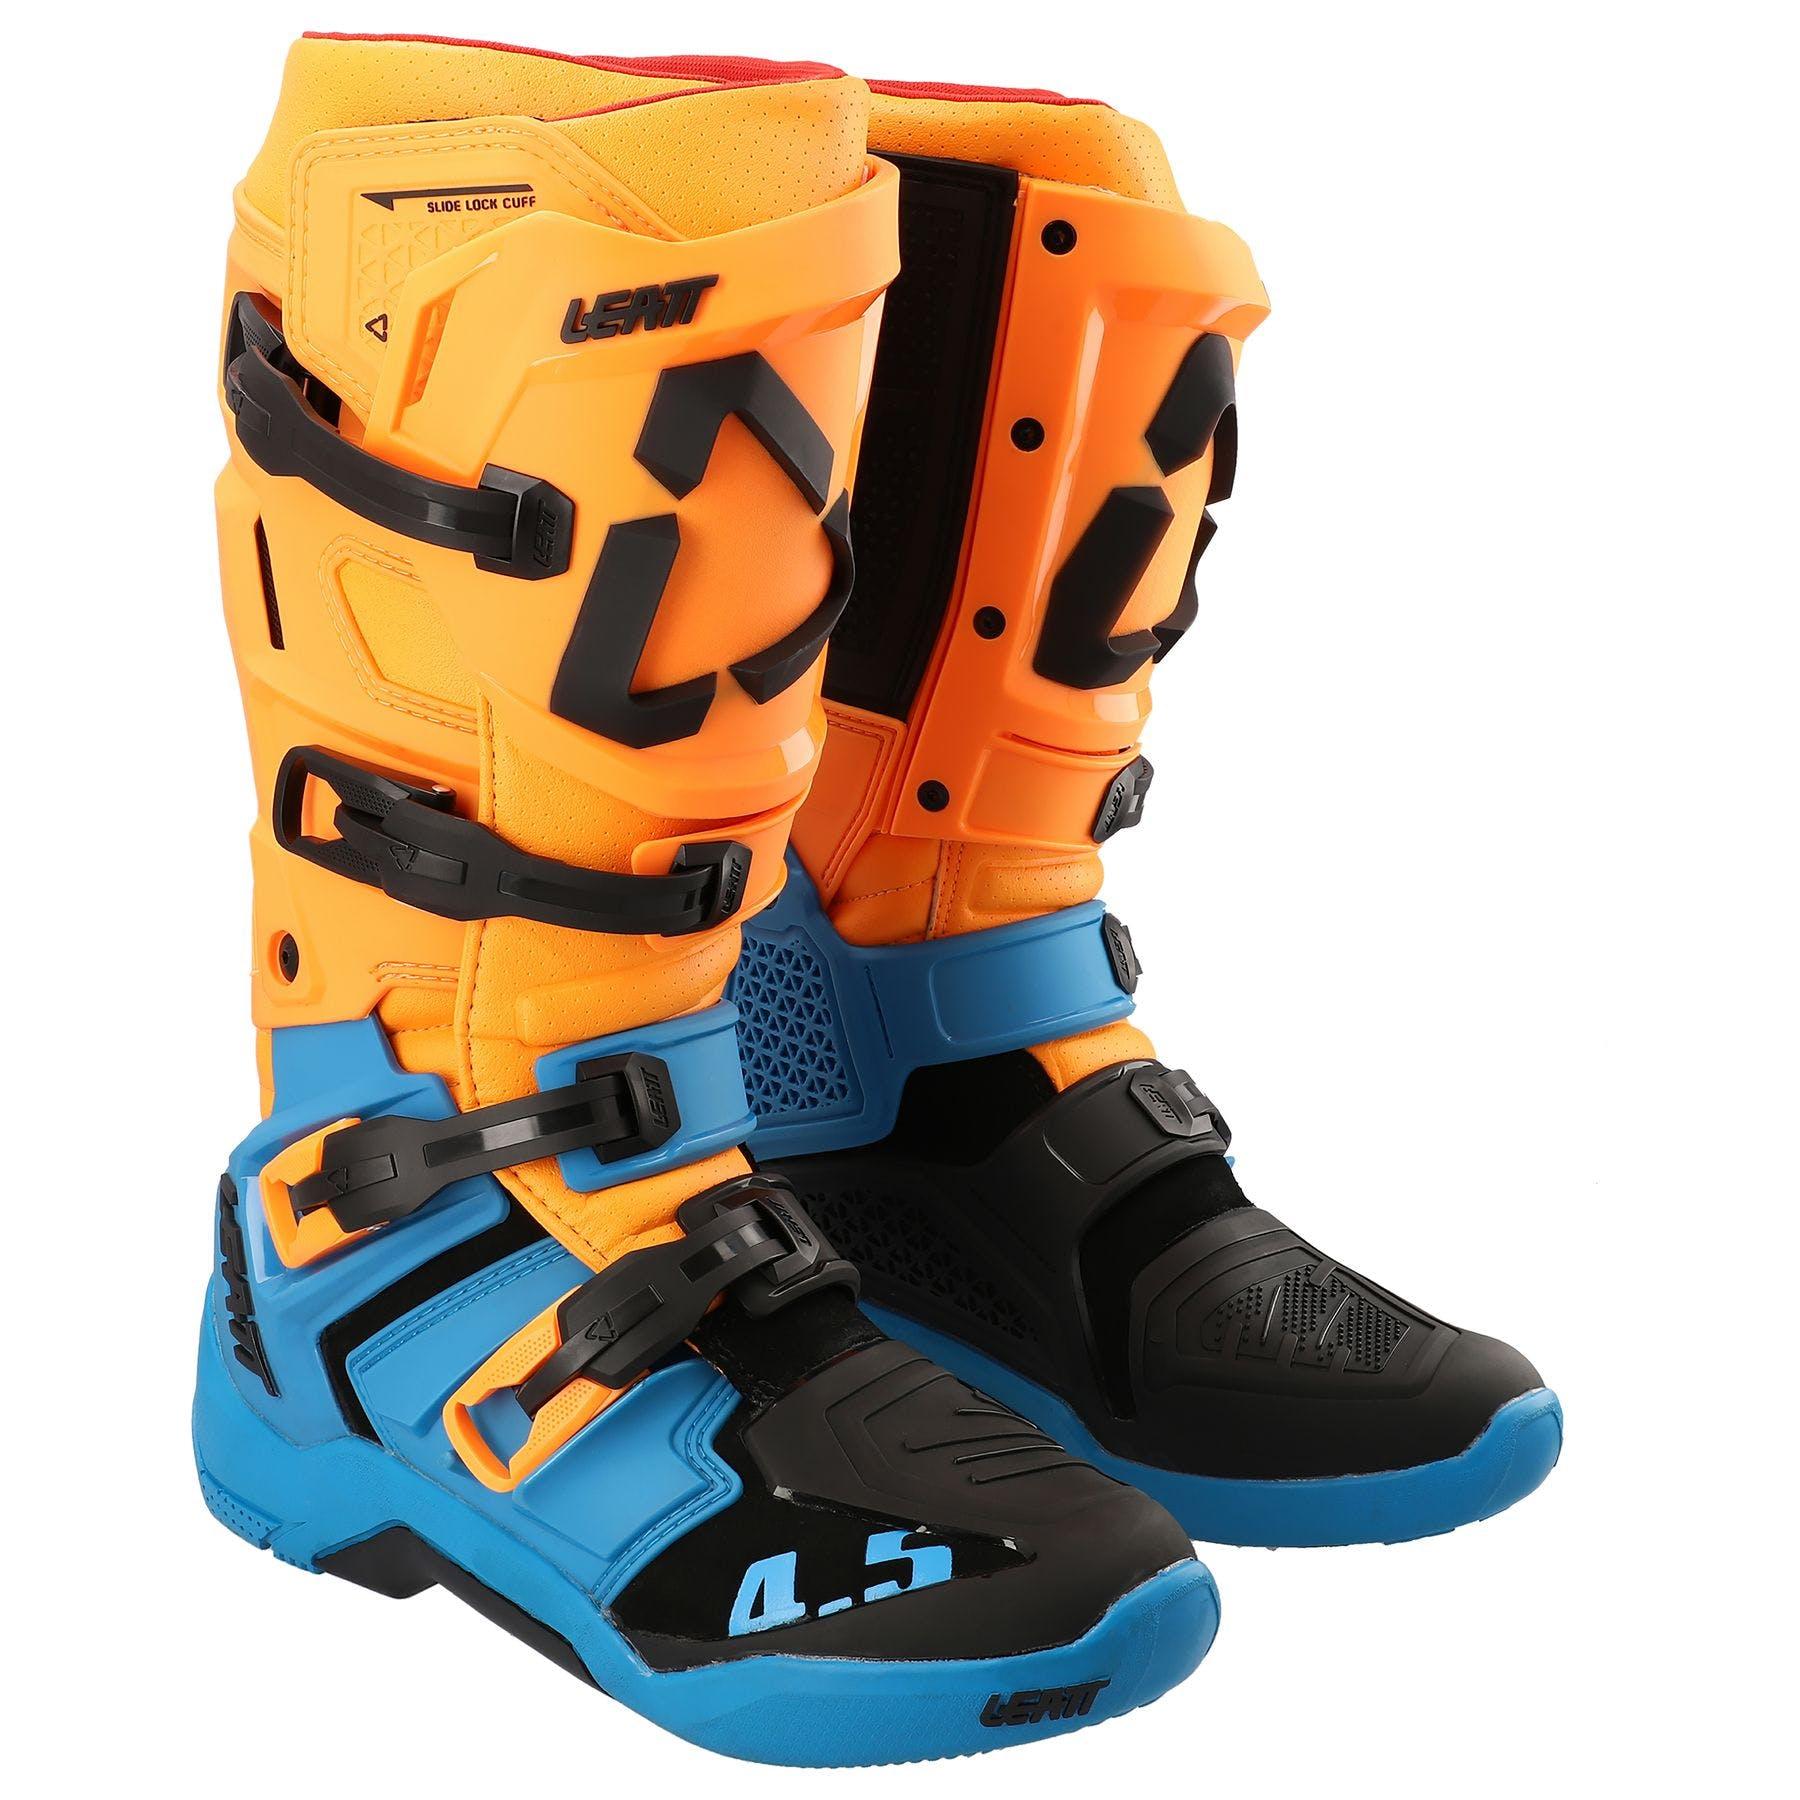 Leatt Pair Enduro And Mens Underwear Mx Boot Socks Grey Black All Sizes